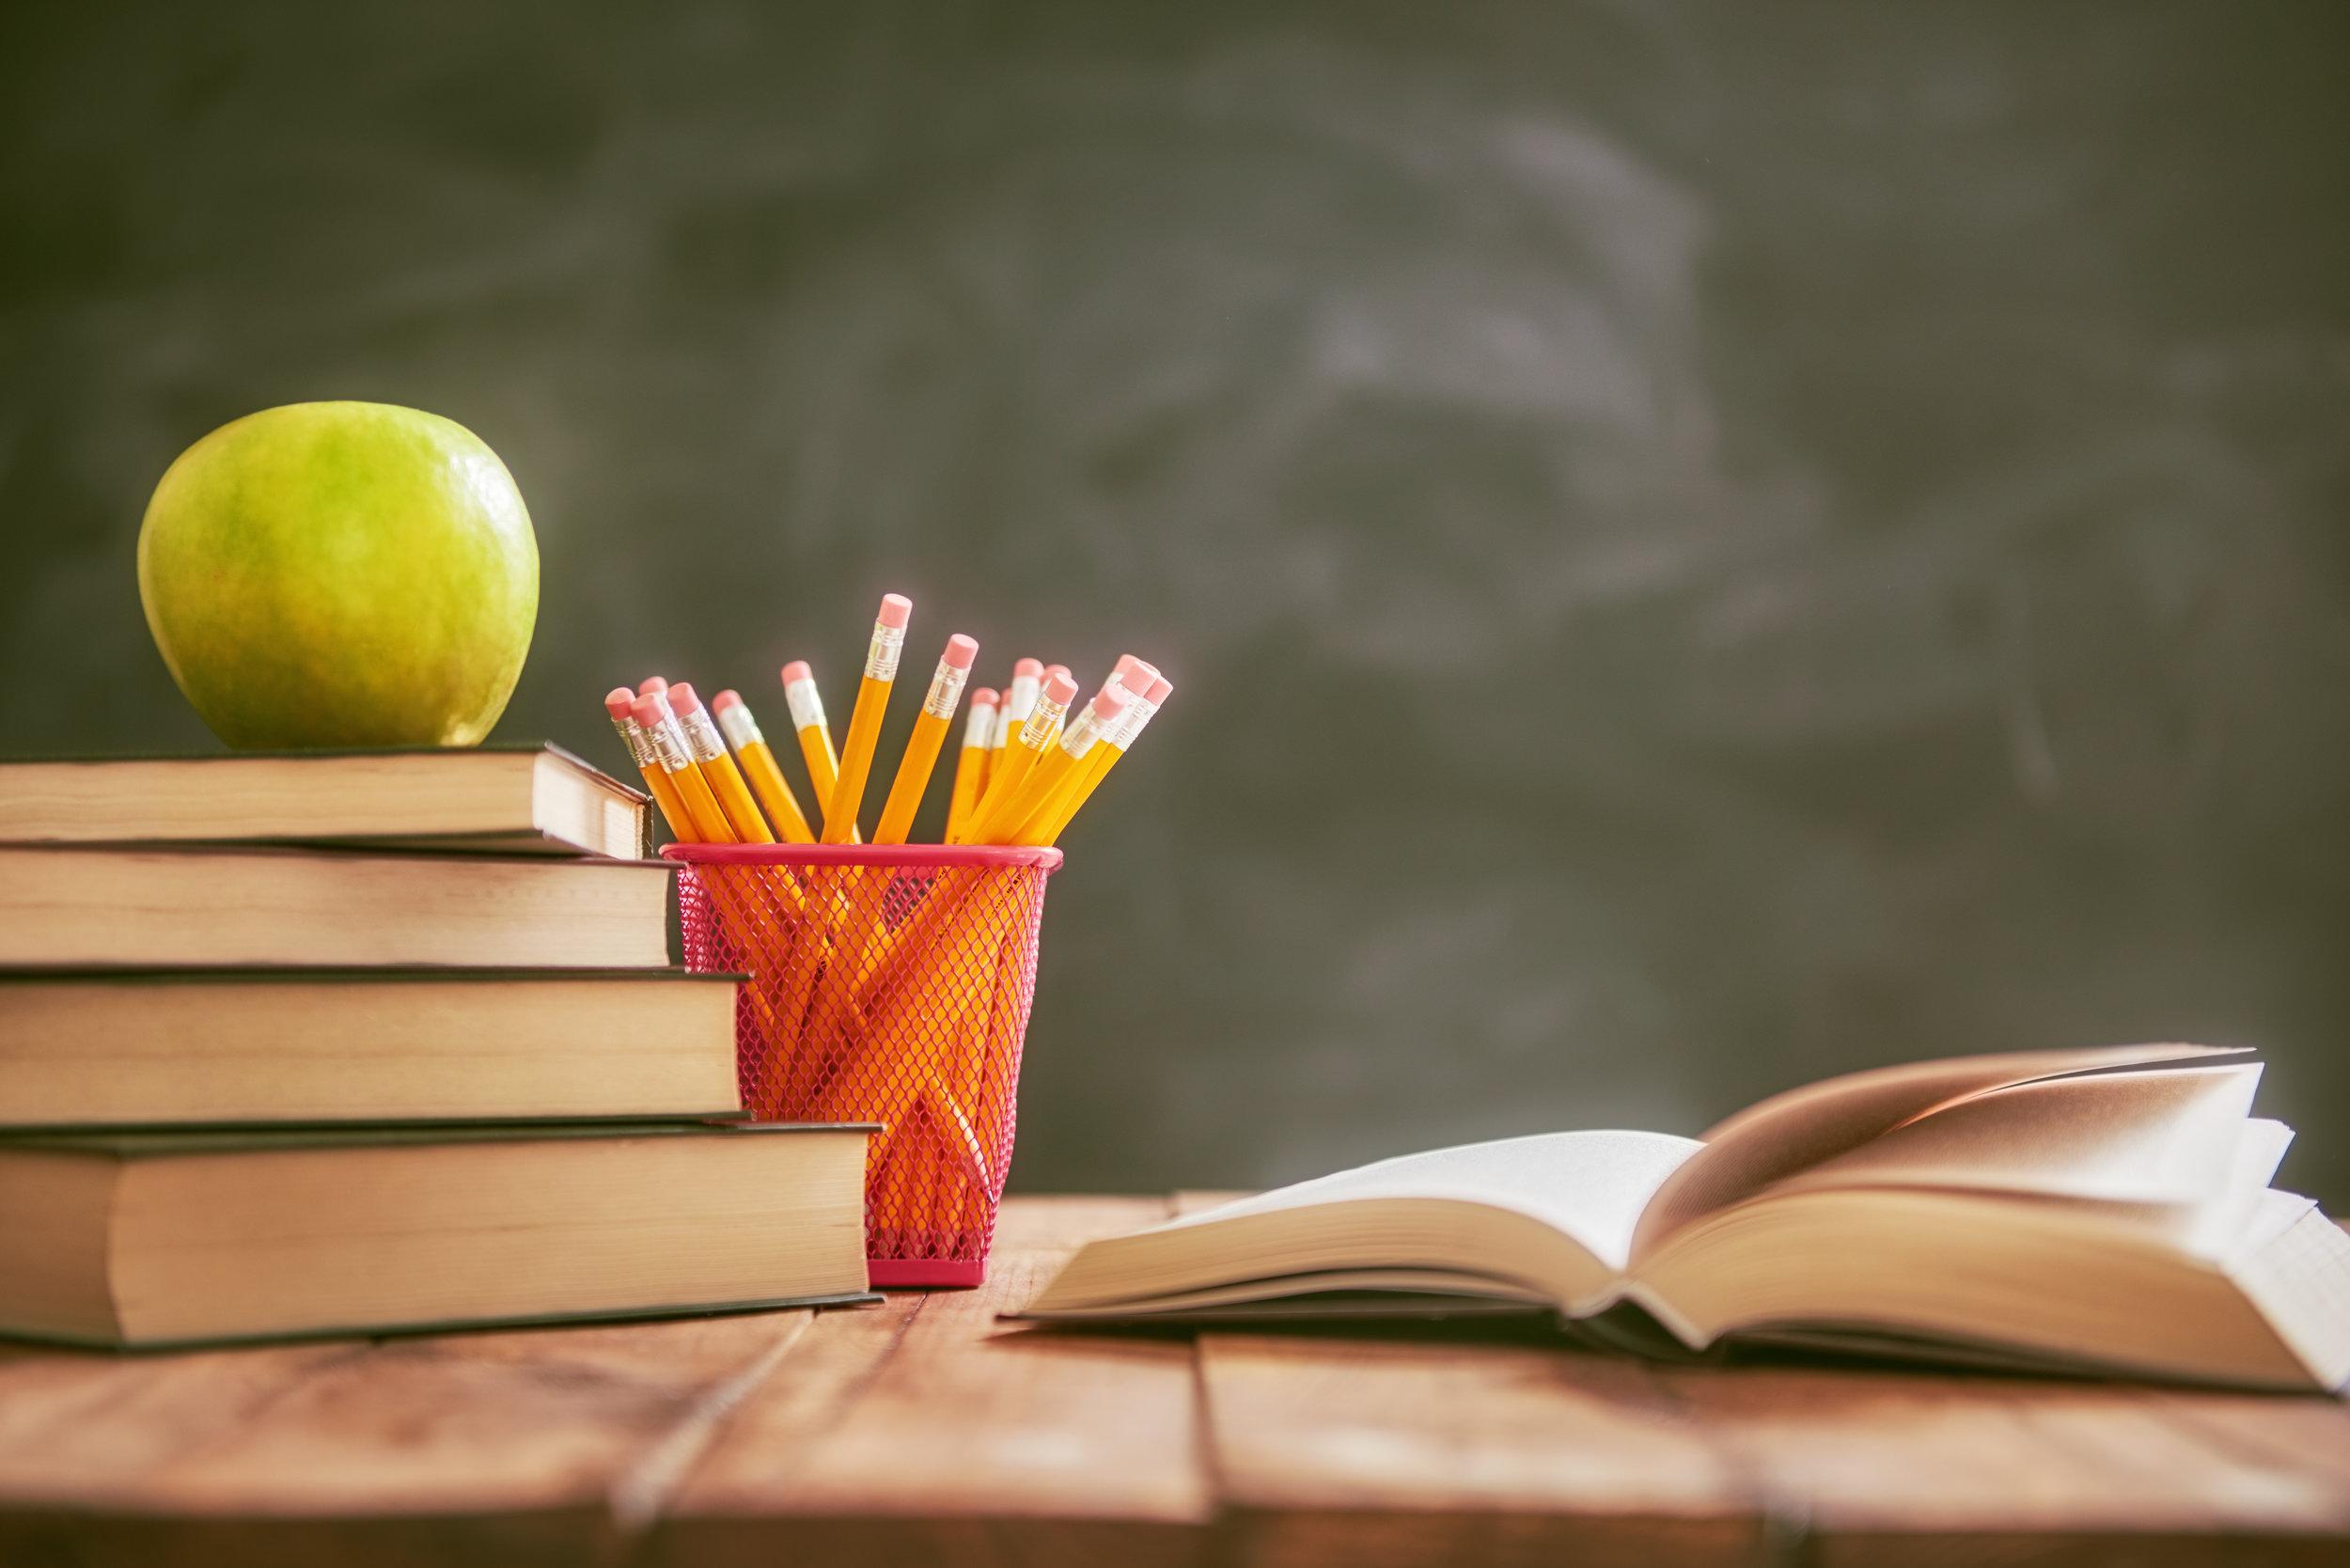 PARENTS - Resources & Information